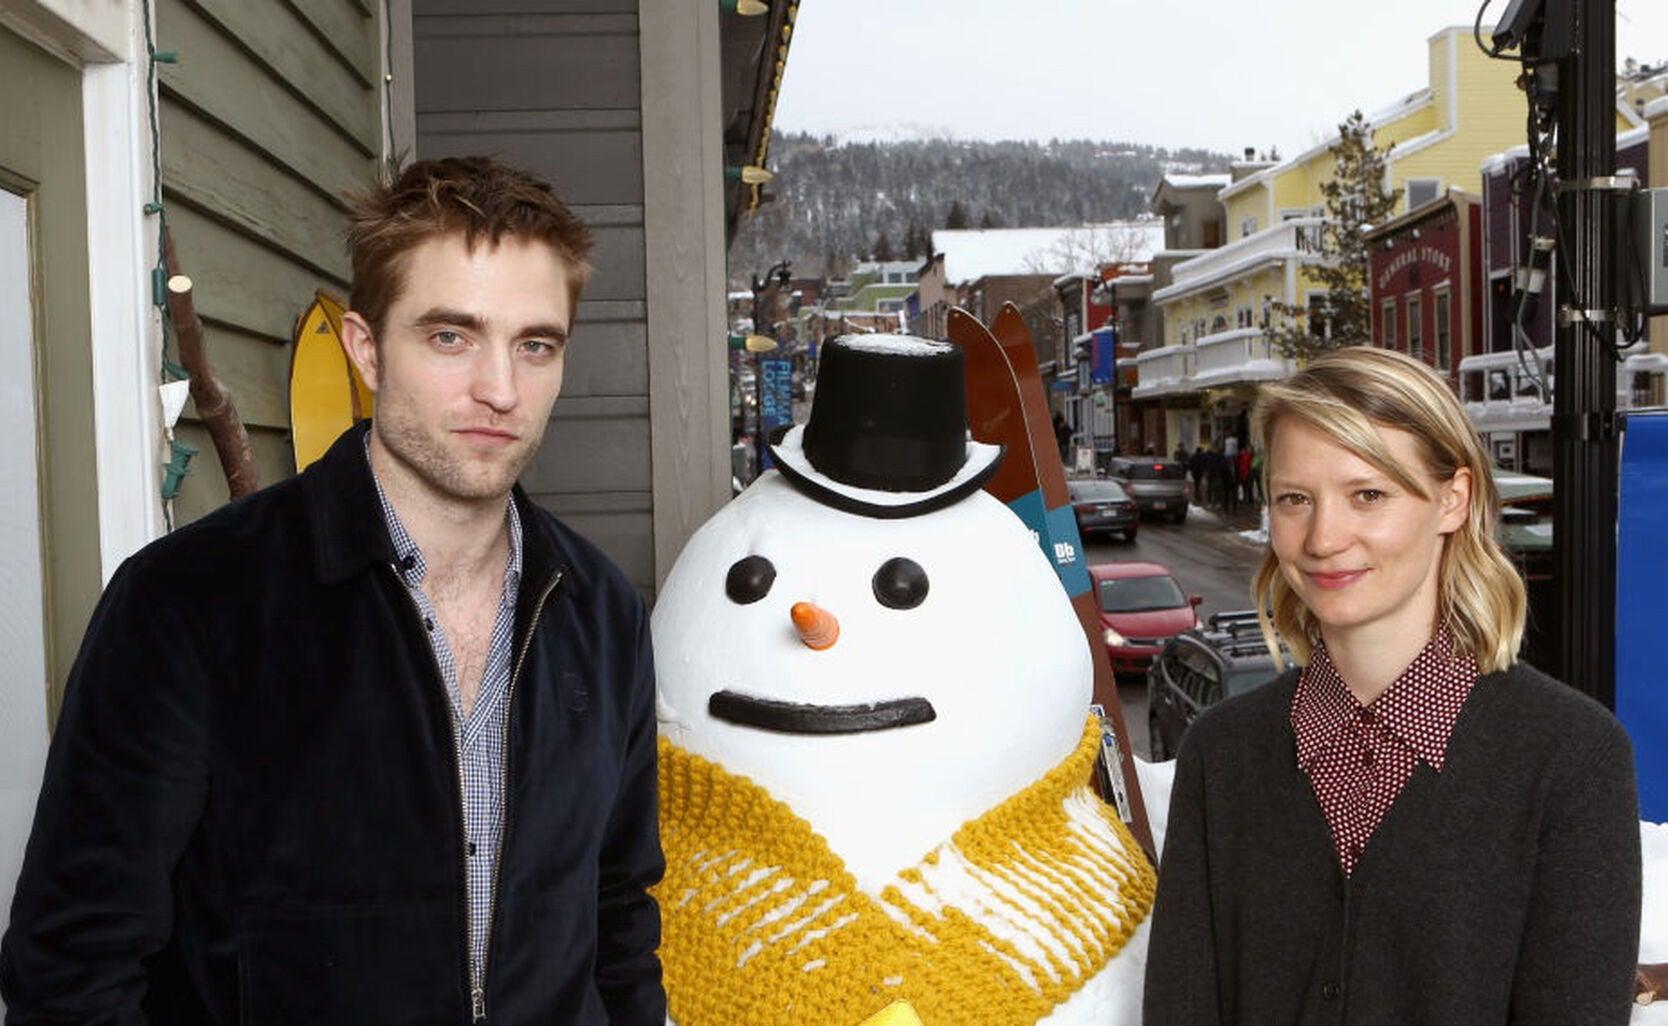 Actors Robert Pattinson and Mia Wasikowska